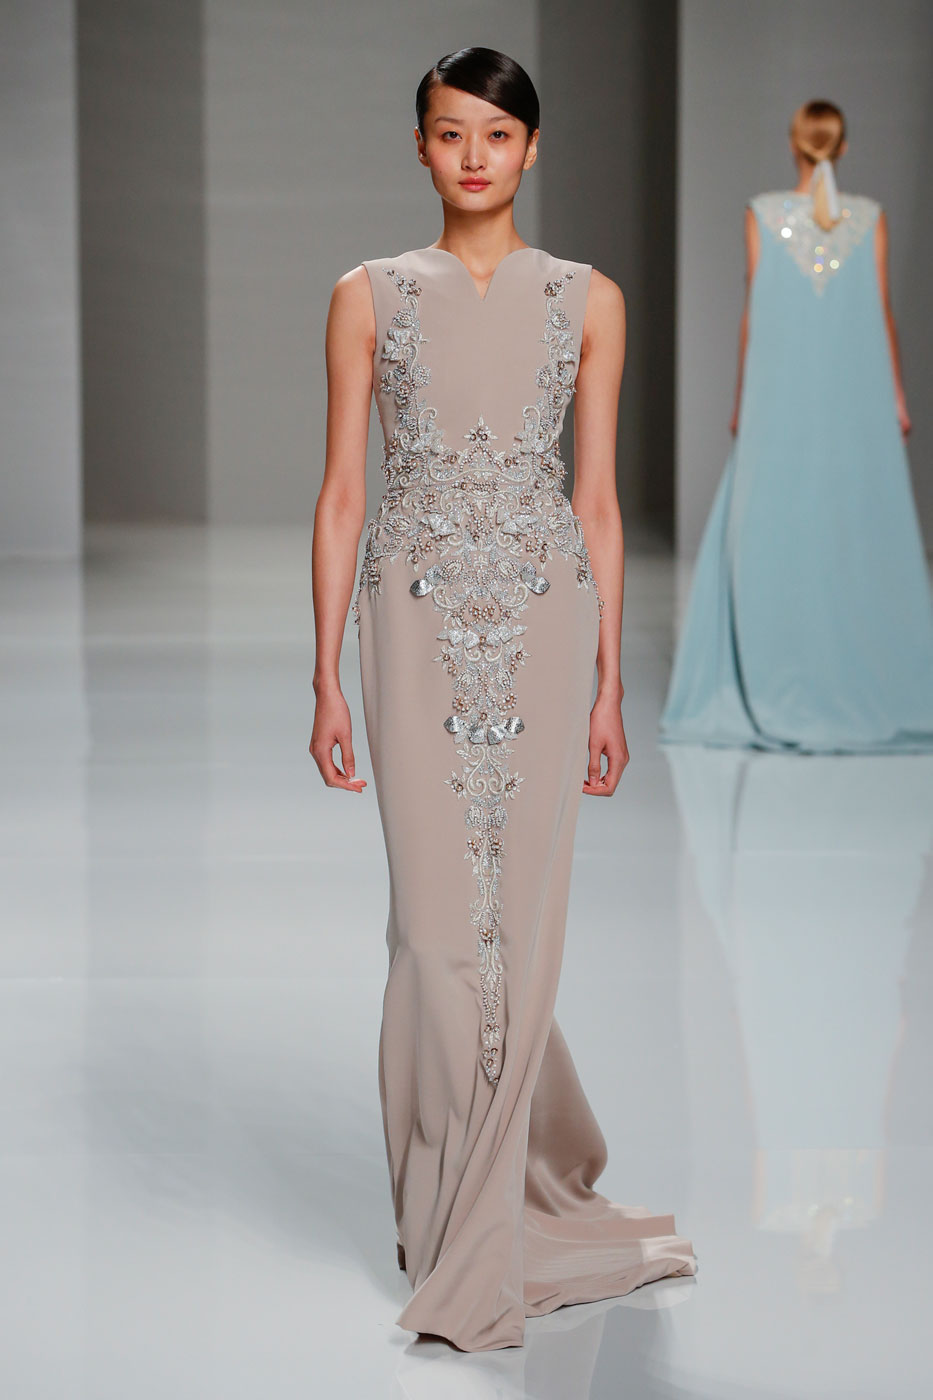 Georges-Hobeika-fashion-runway-show-haute-couture-paris-spring-2015-the-impression-39